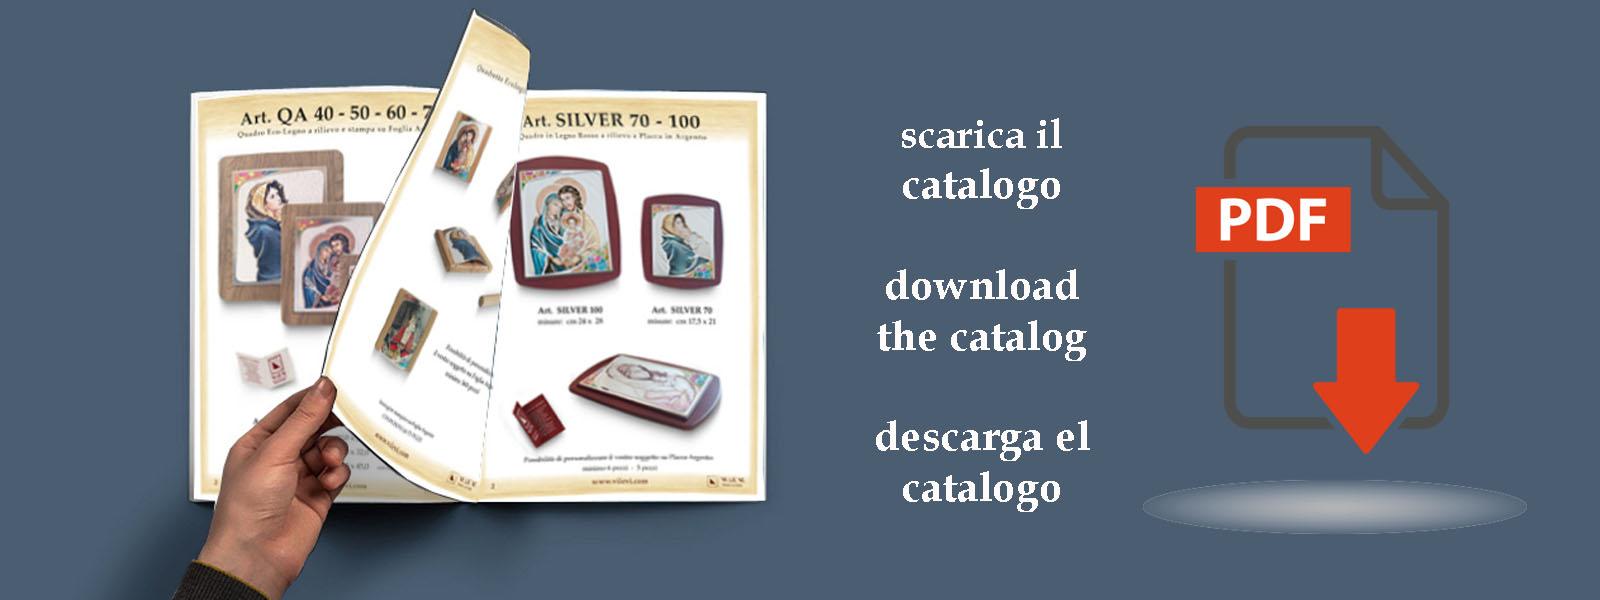 slider_download catalogo 01